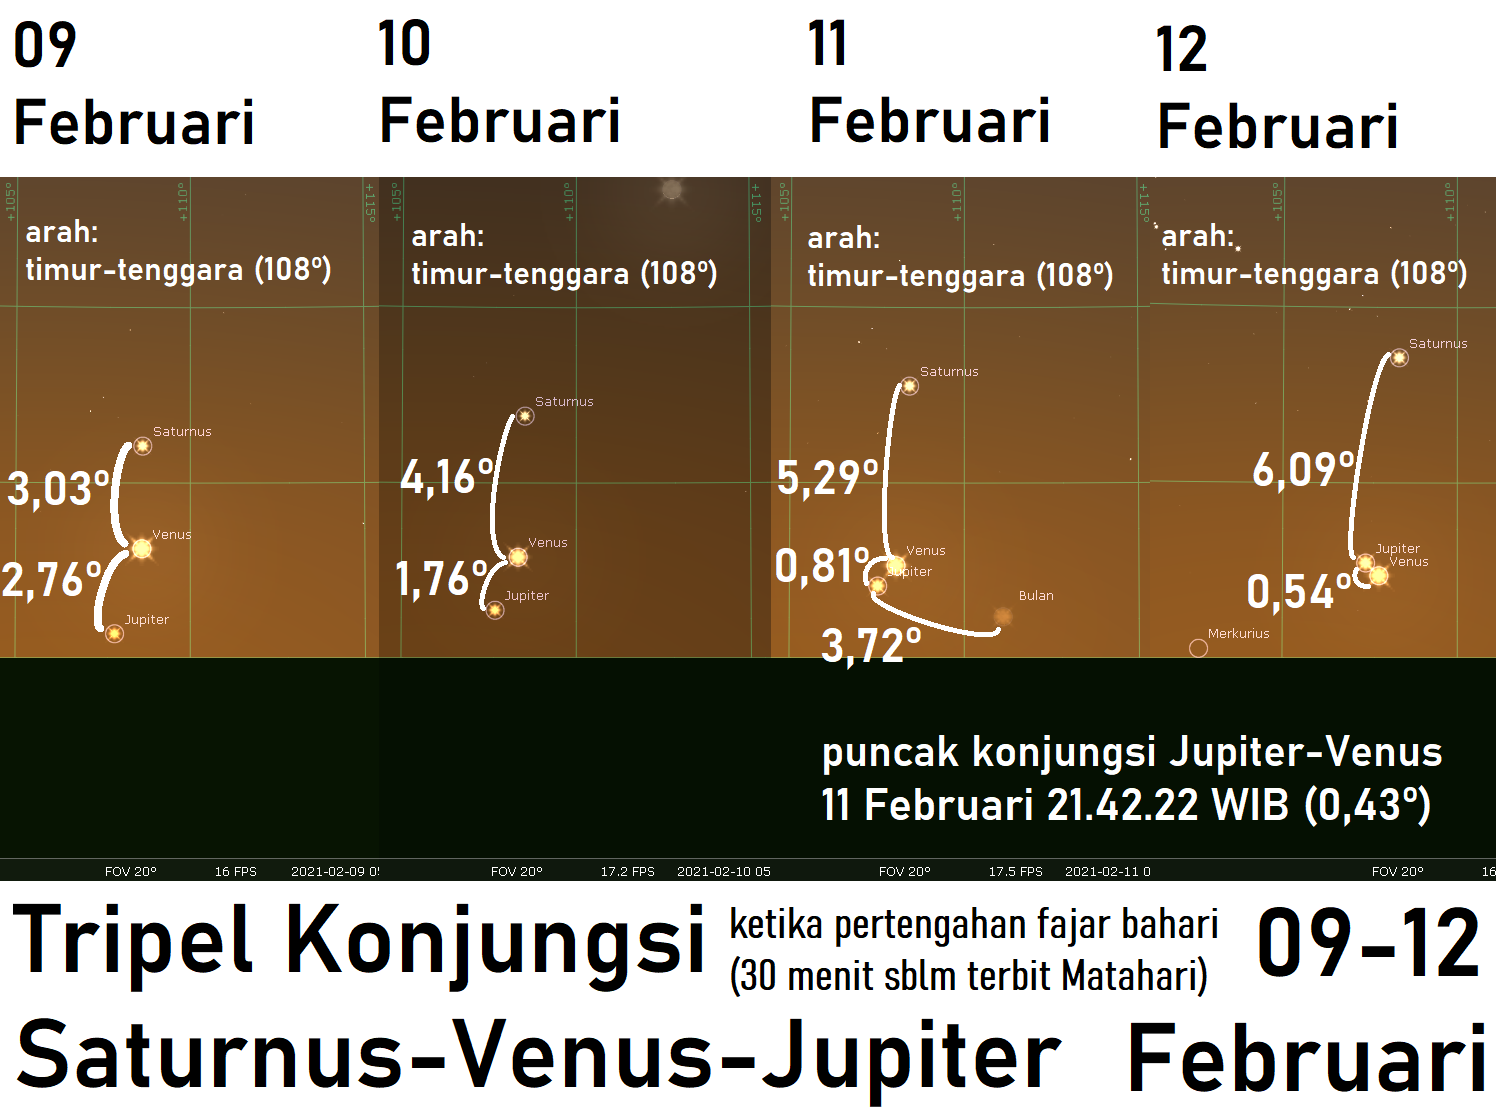 Tripel Konjungsi Saturnus-Venus-Jupiter